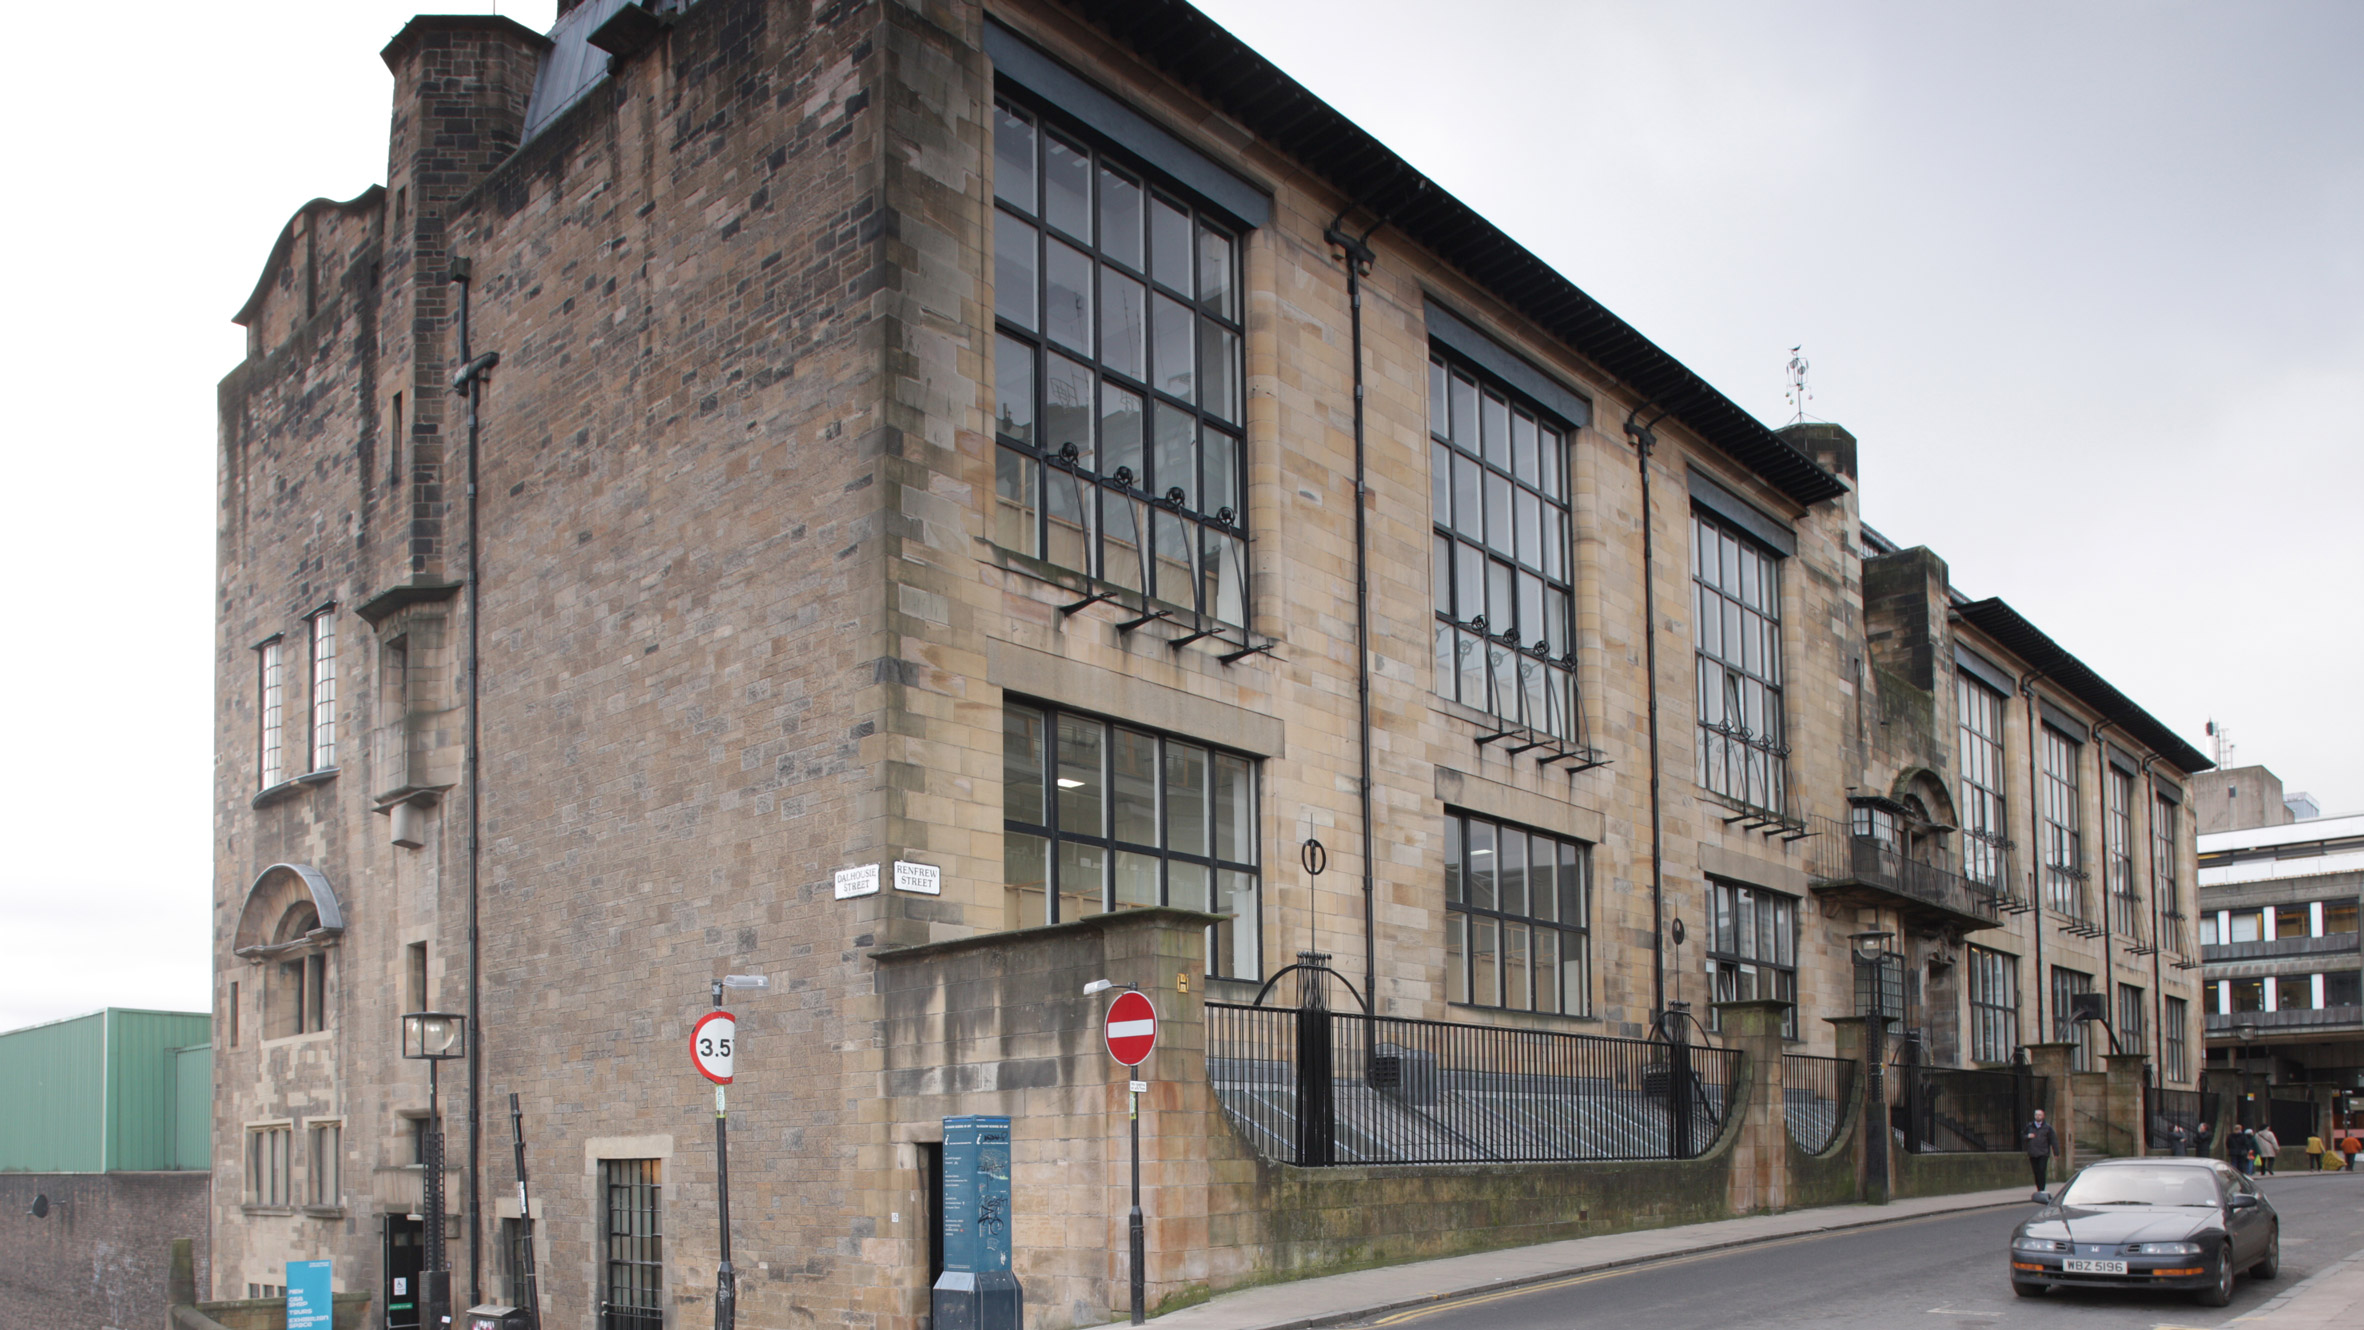 art article in charles rennie mackintosh buildings